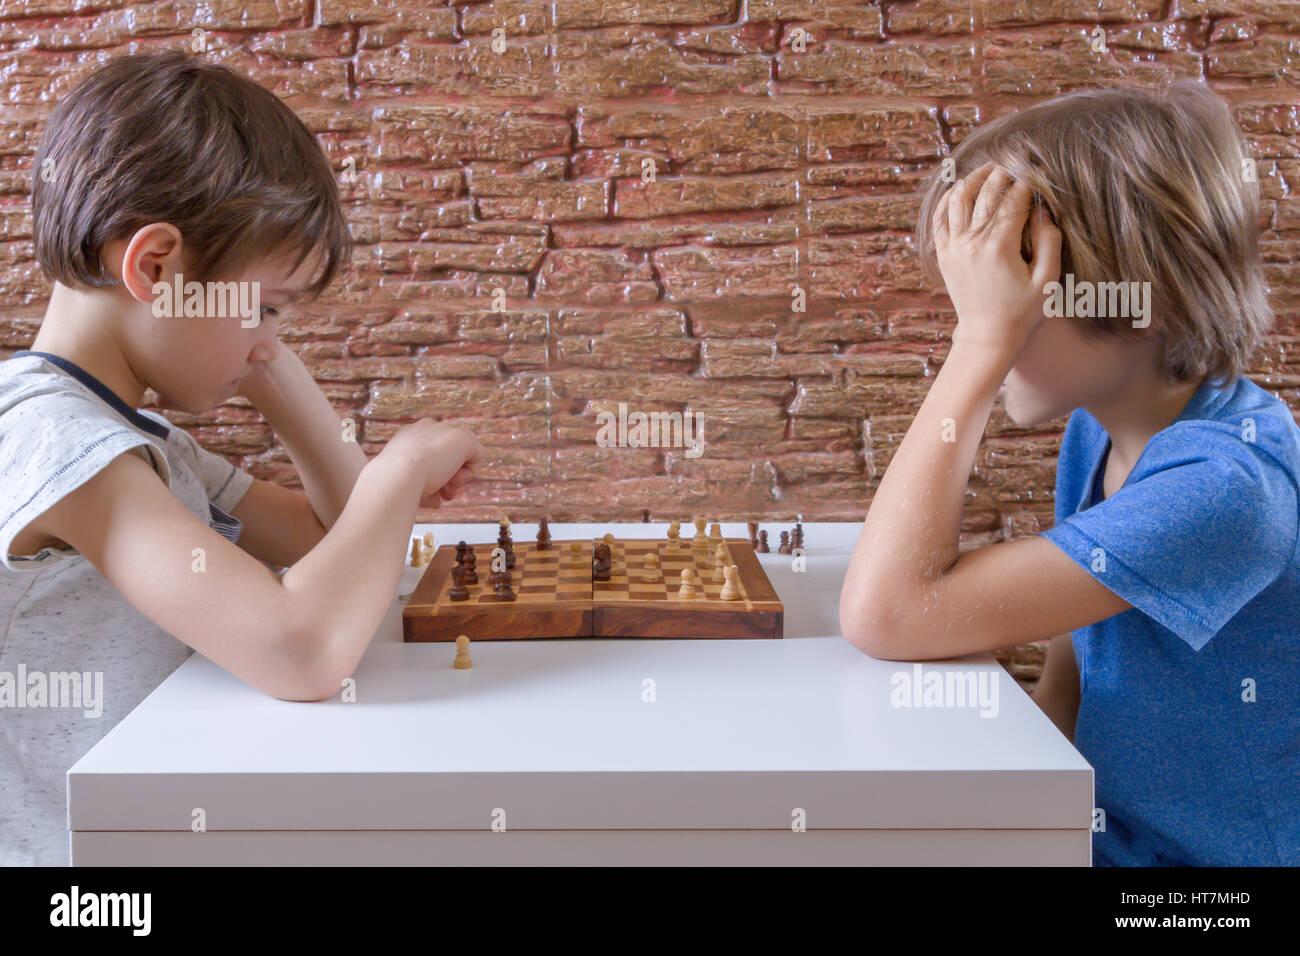 Kids playing chess Stock Photo